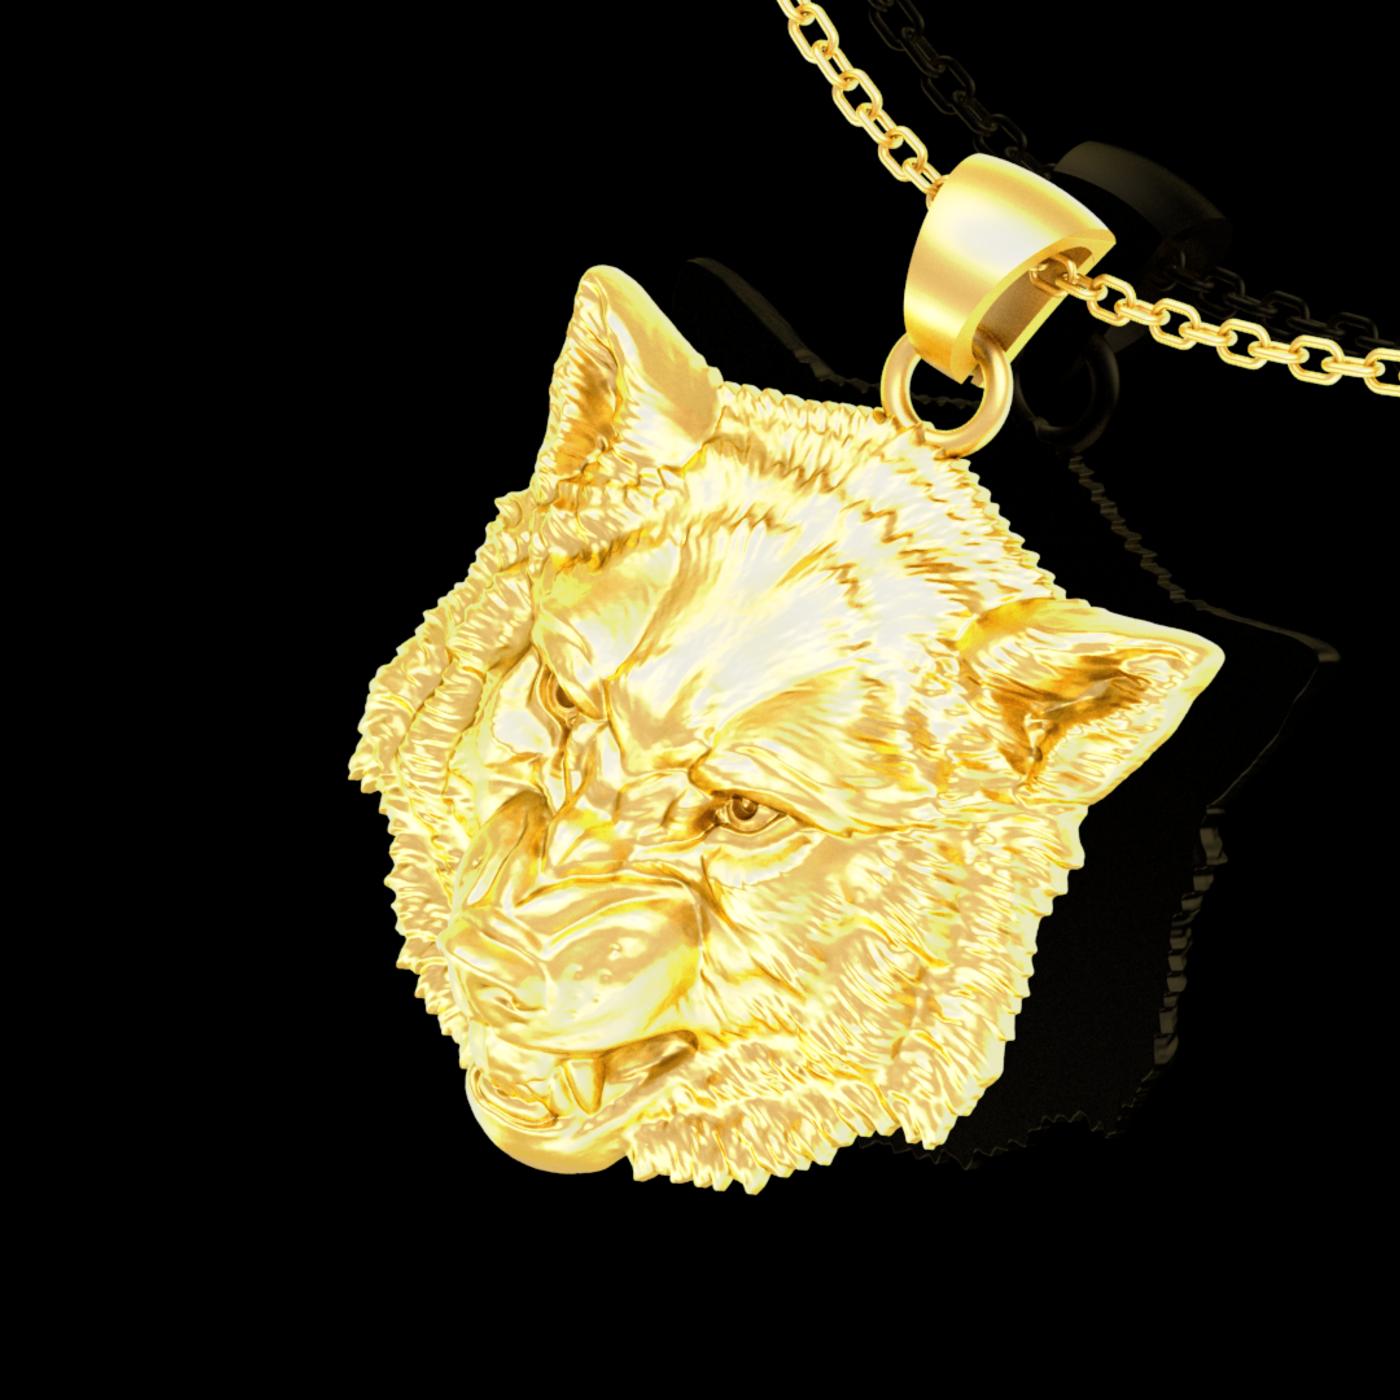 Wolf Head Sculpture Pendant jewelry Gold 3D print model